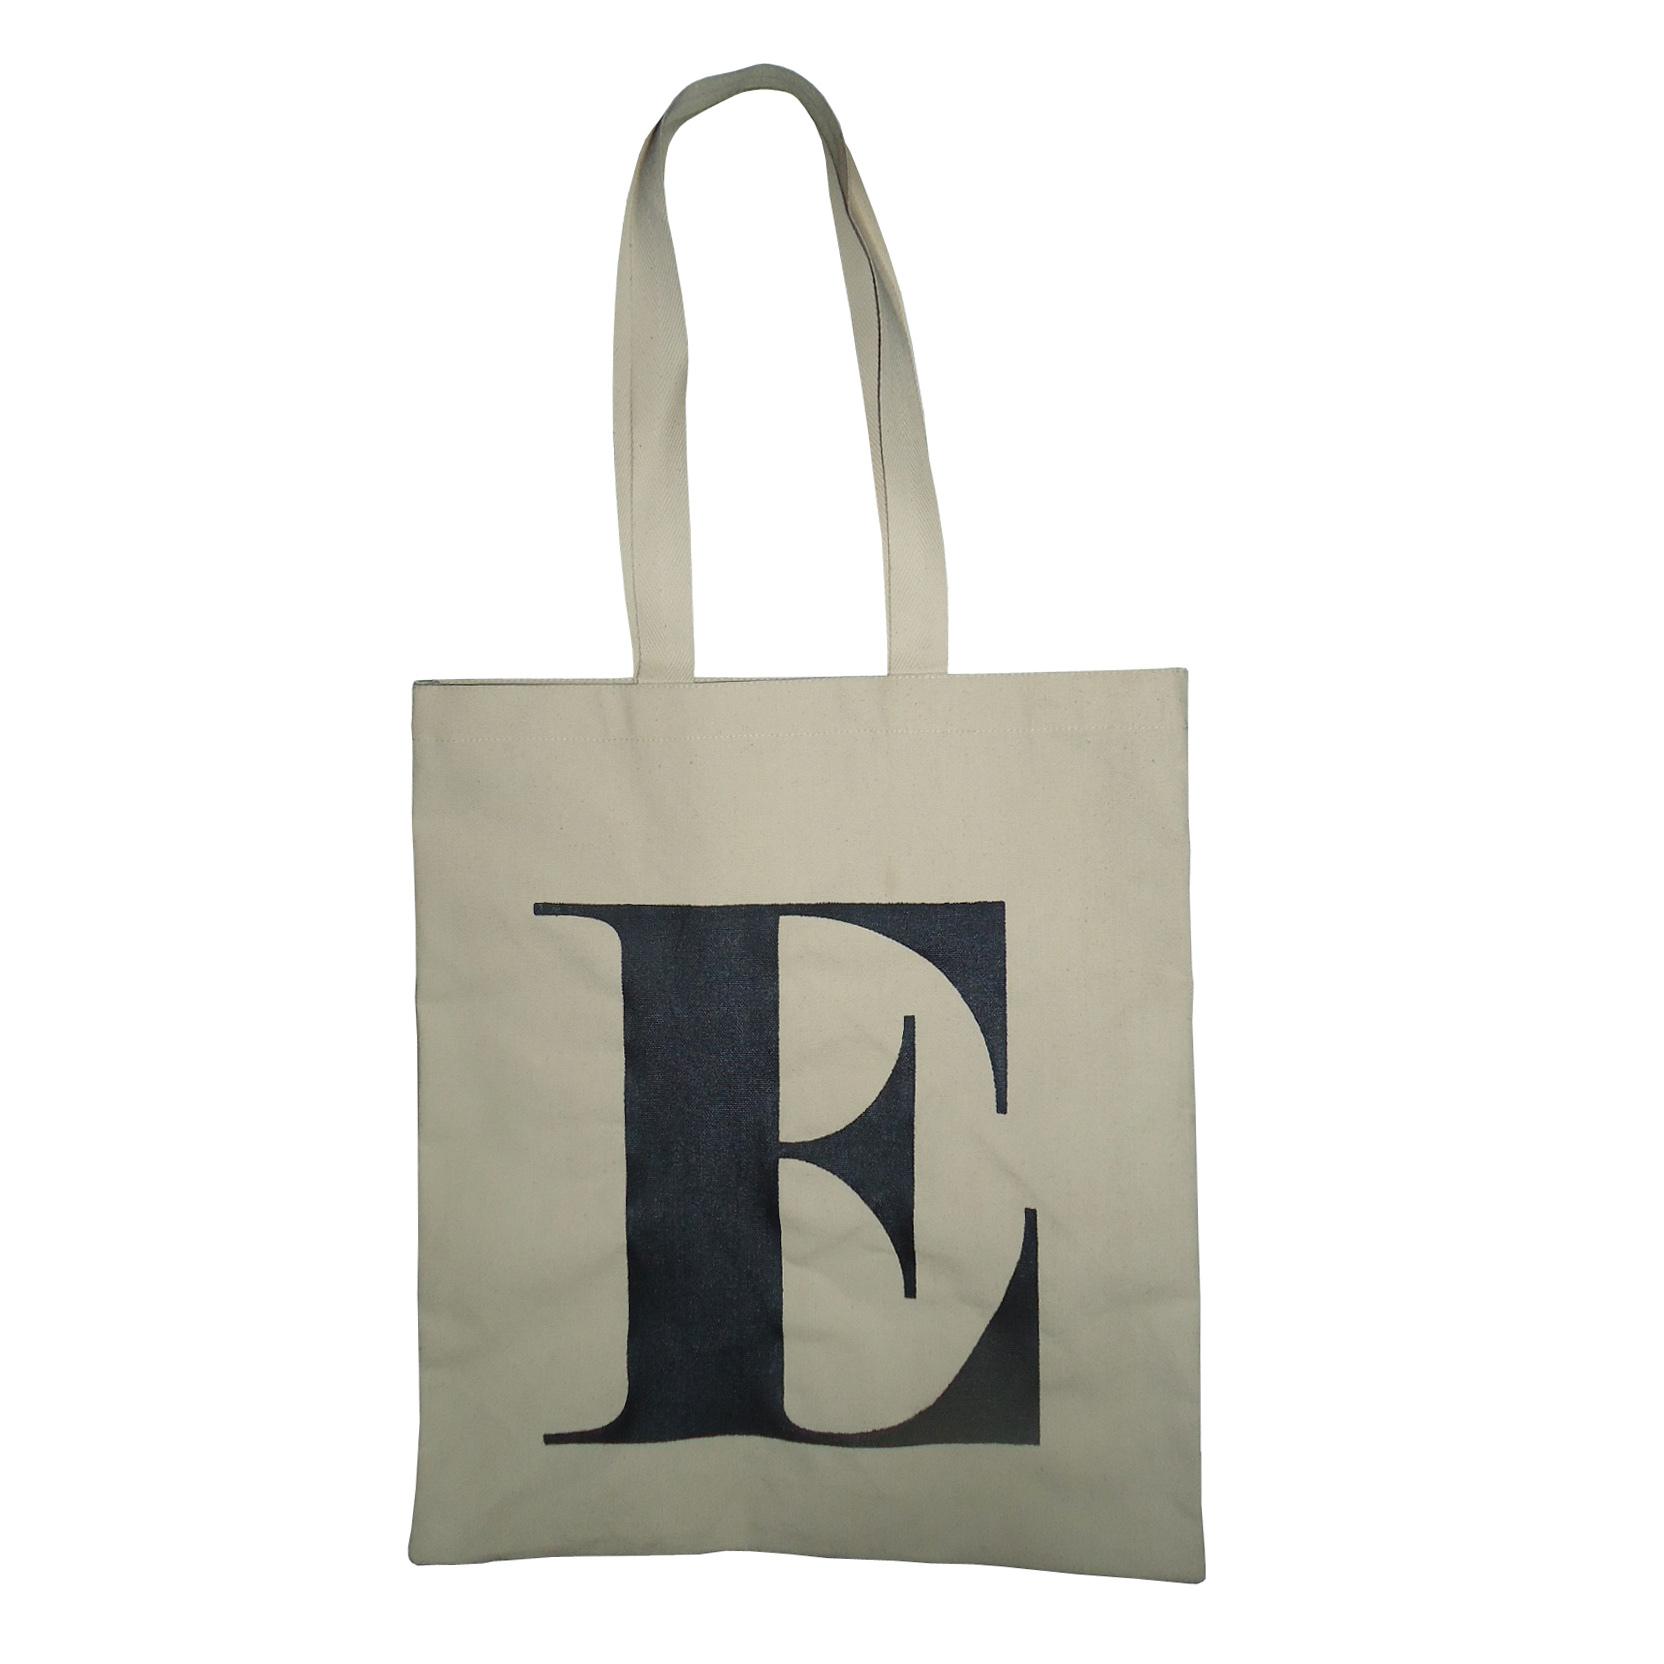 10 Oz Natural Canvas Bag With Soft Web Handle